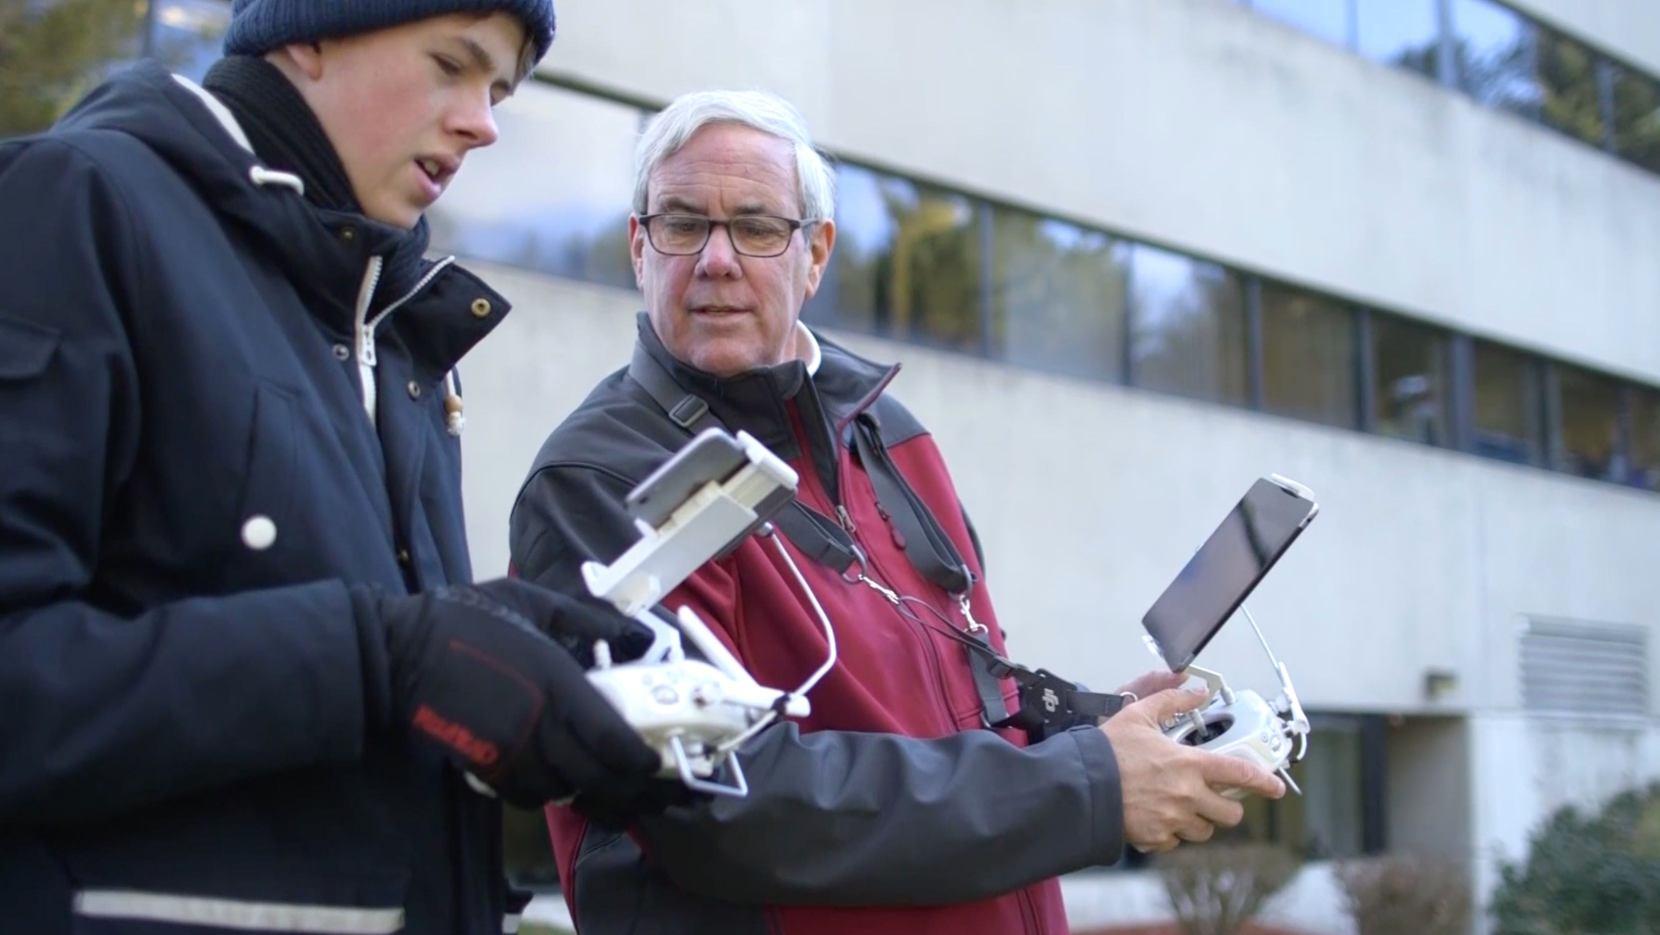 Dual drone pilots